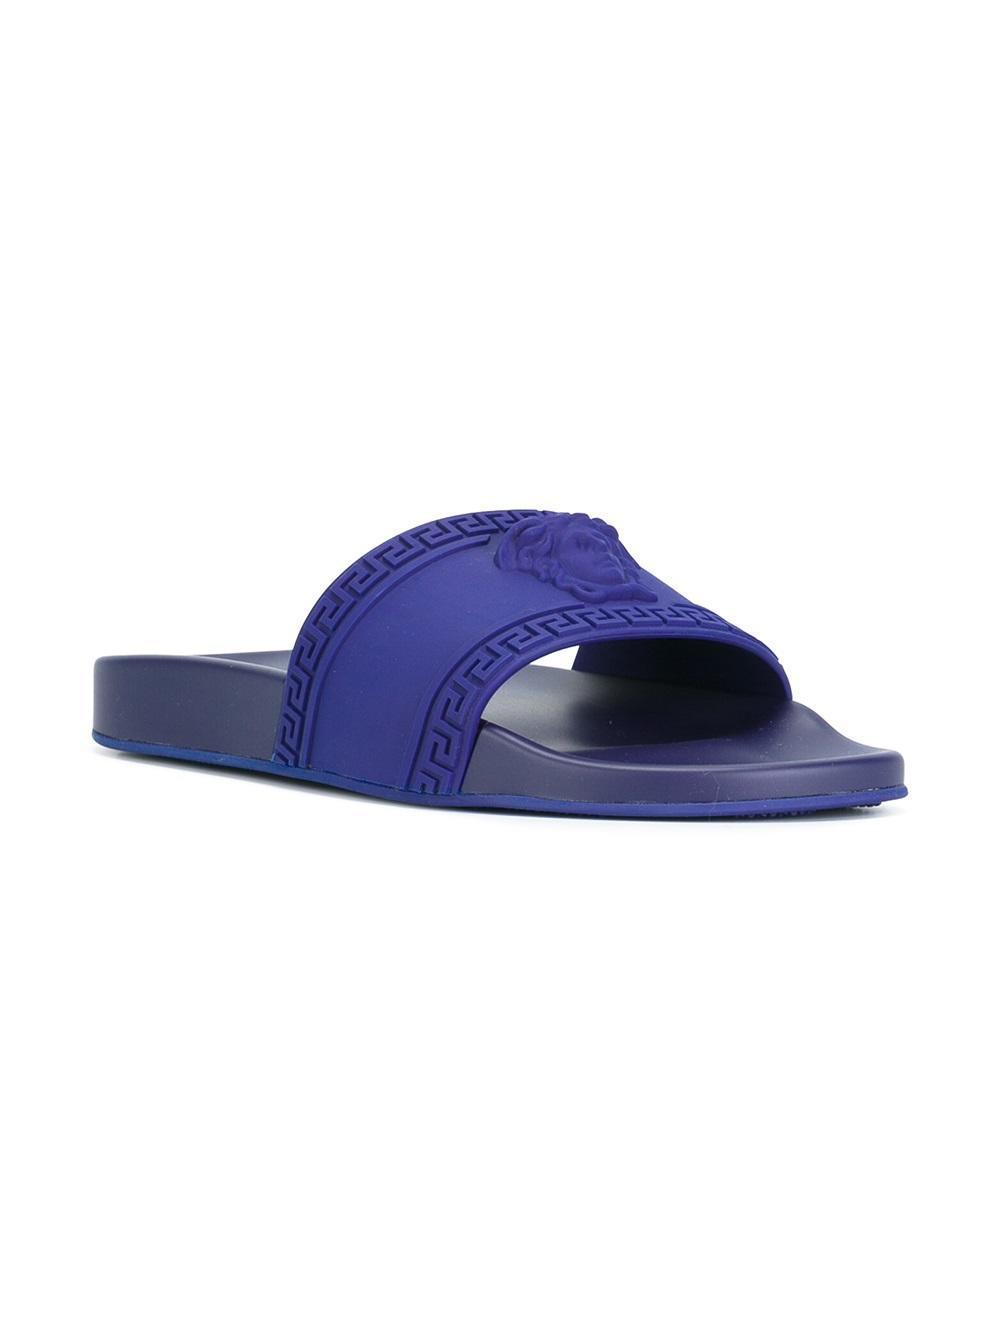 e6bd61a7a7432 Lyst - Versace Medusa Pool Slides in Blue for Men